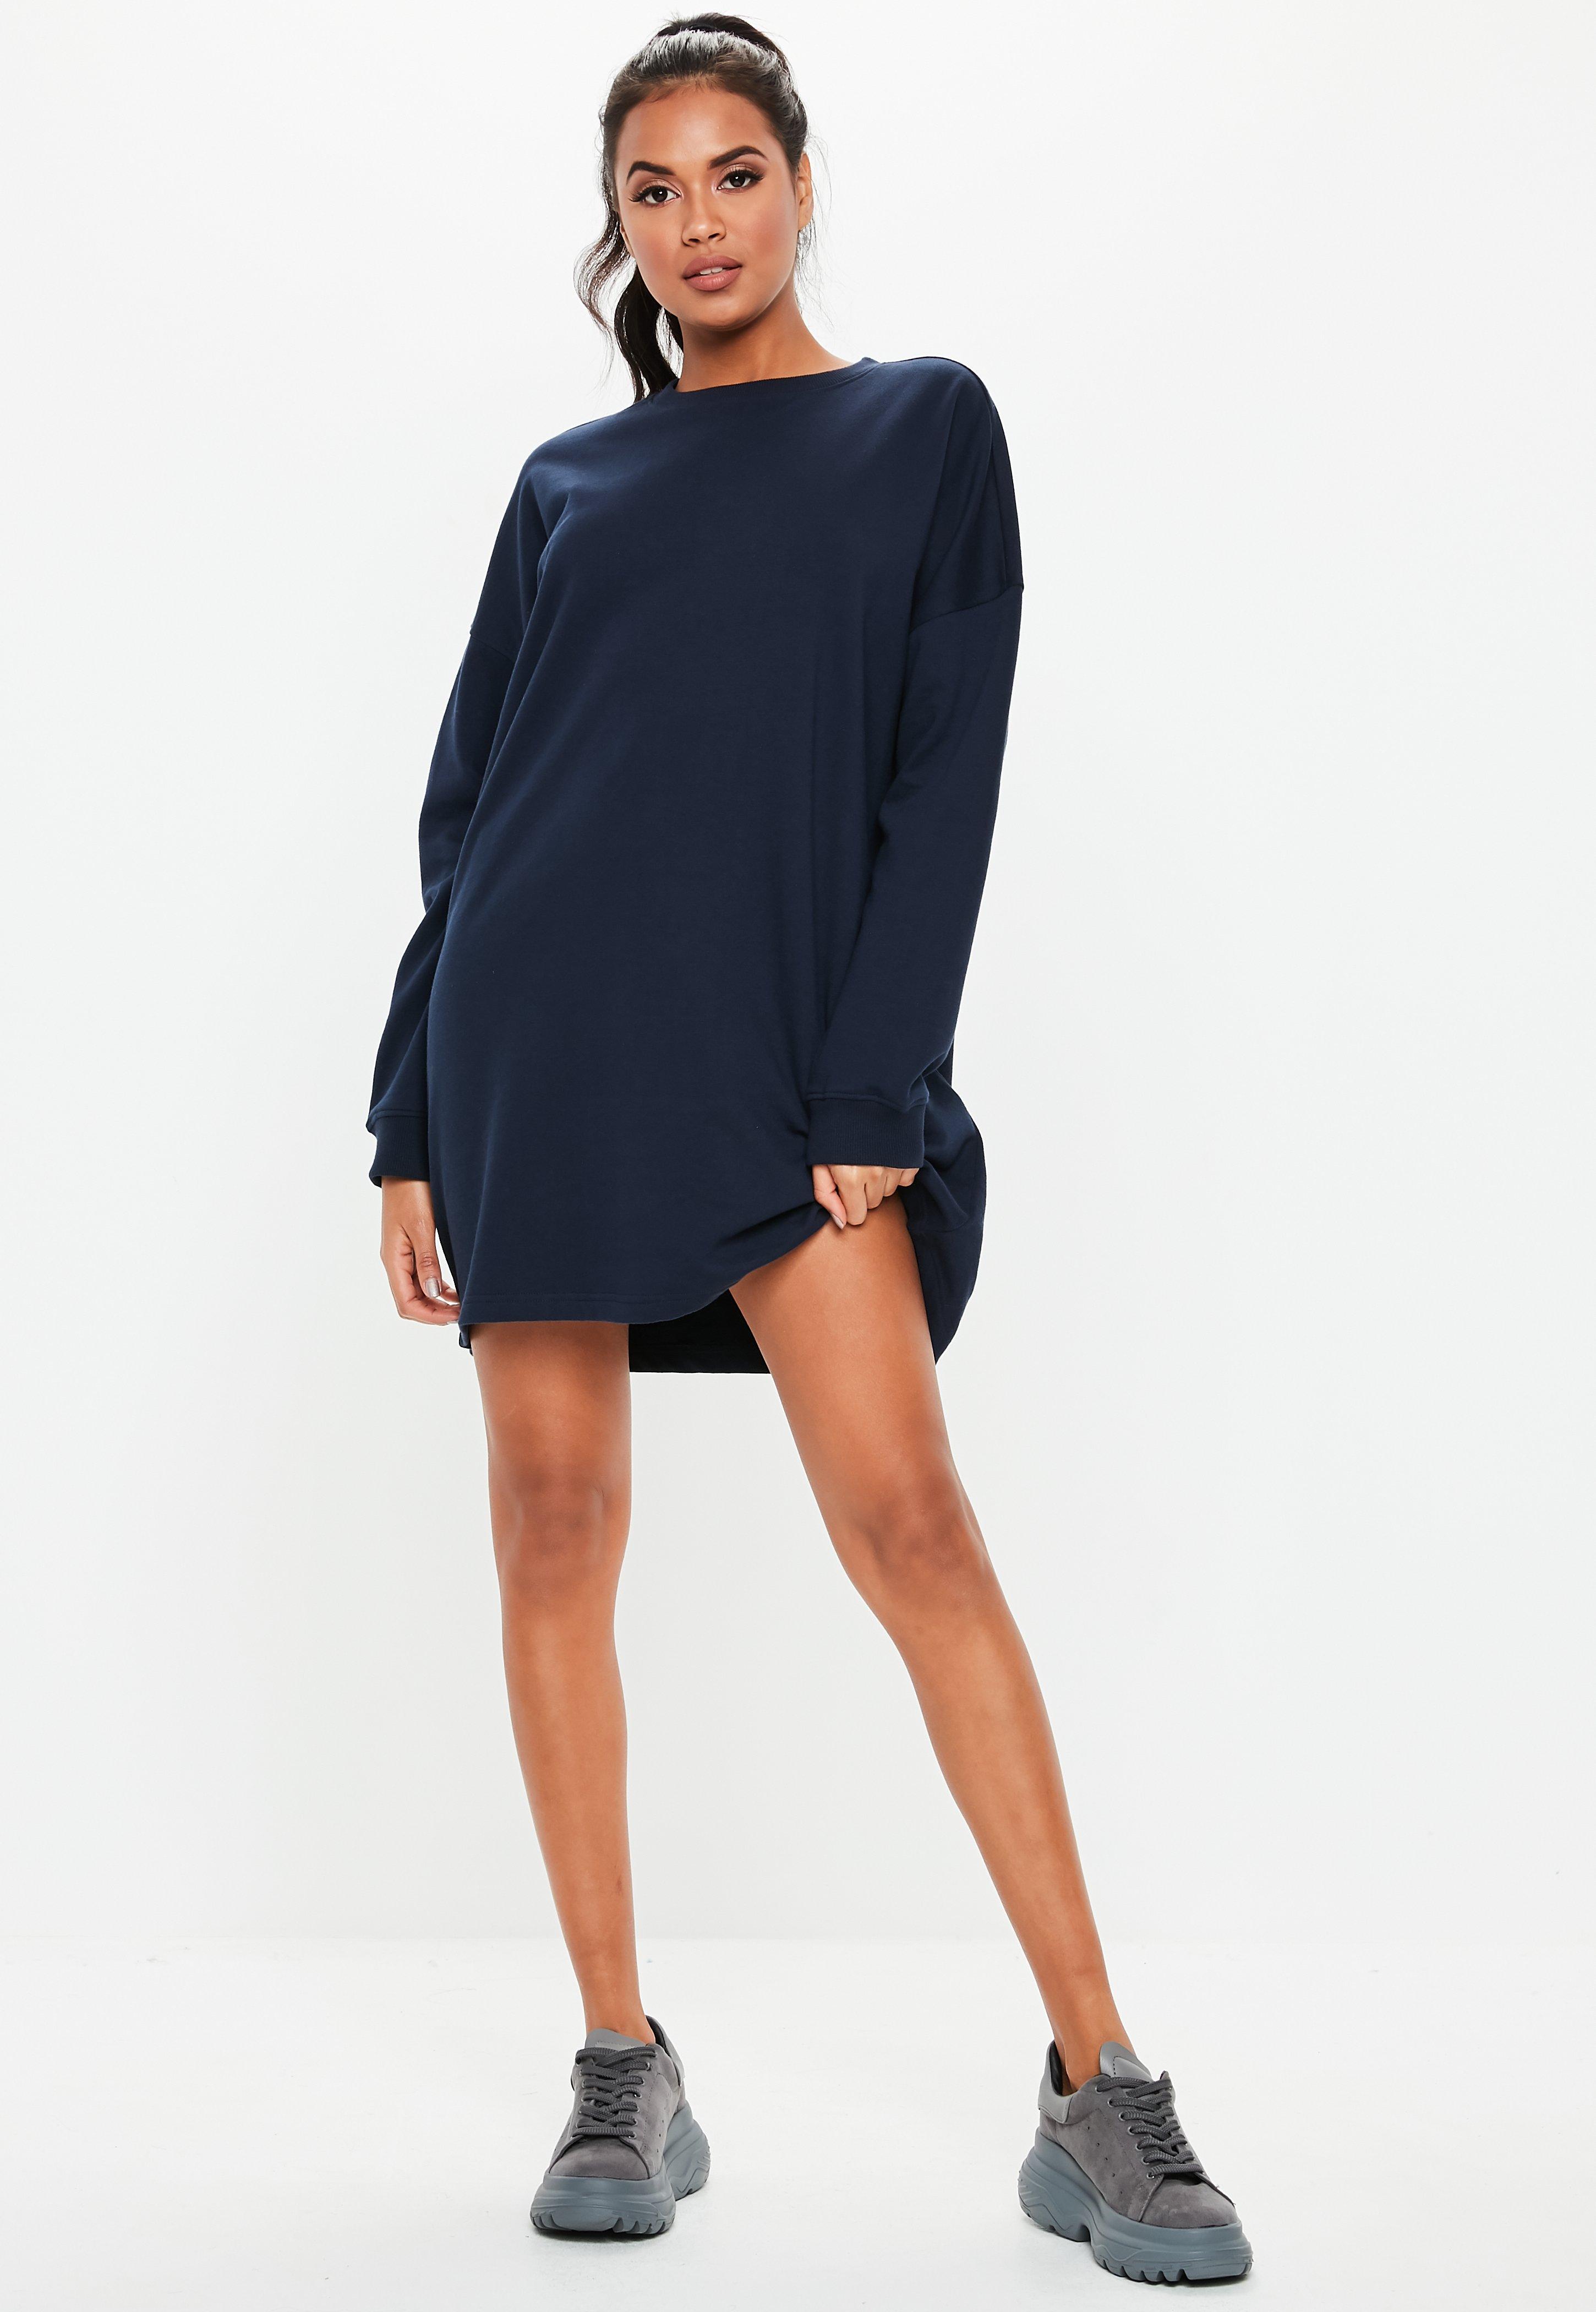 6a262b4a0035d Sweatshirt Dresses